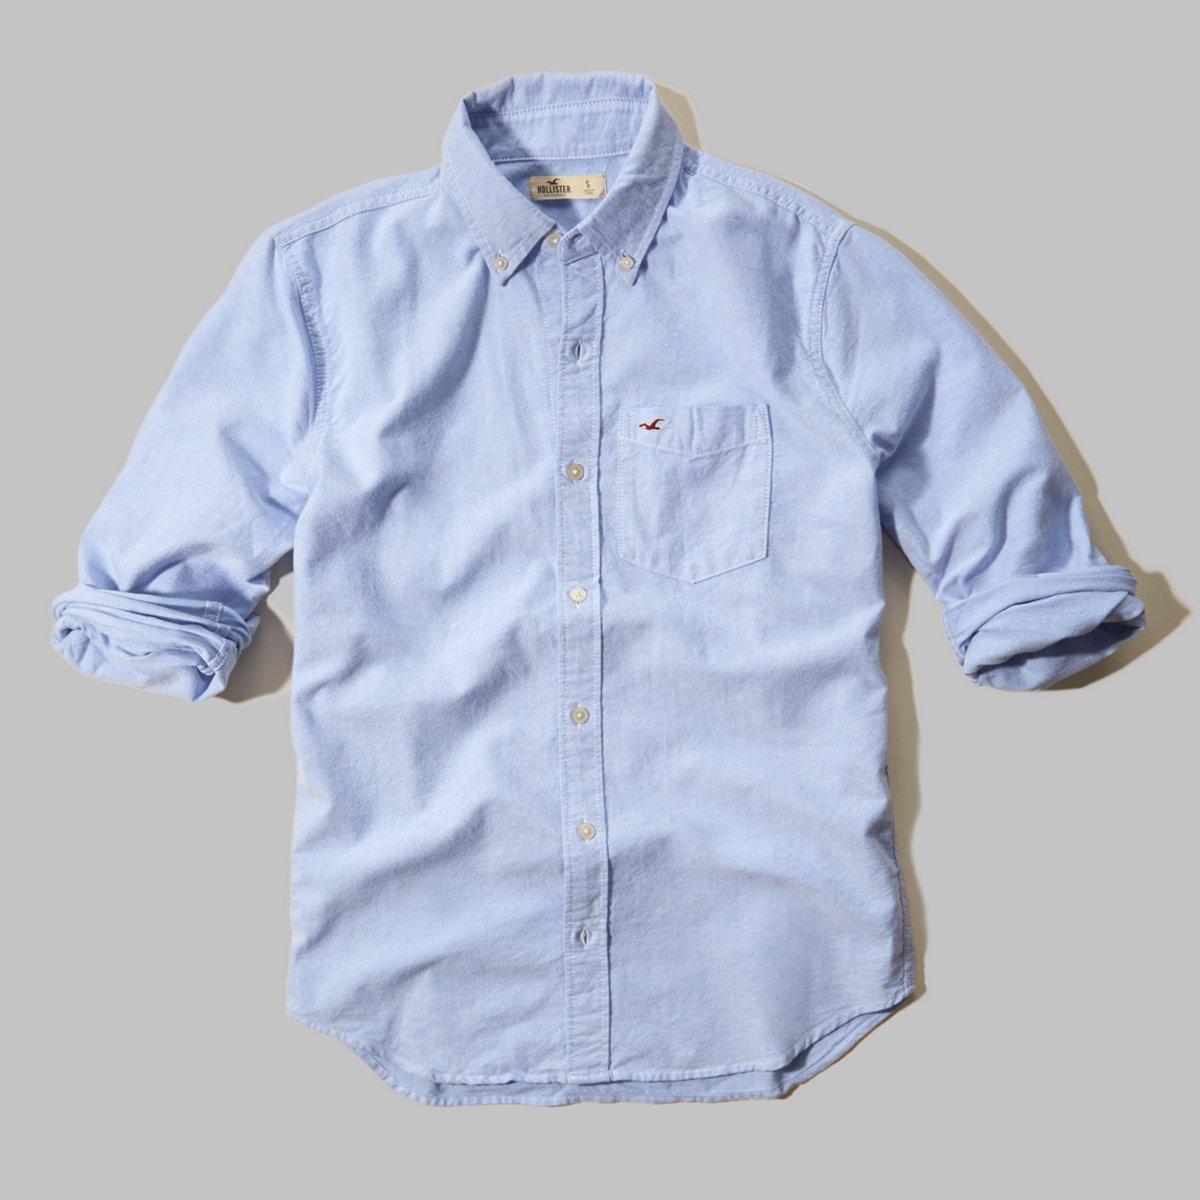 Seacliff Classic Fit Oxford Shirt